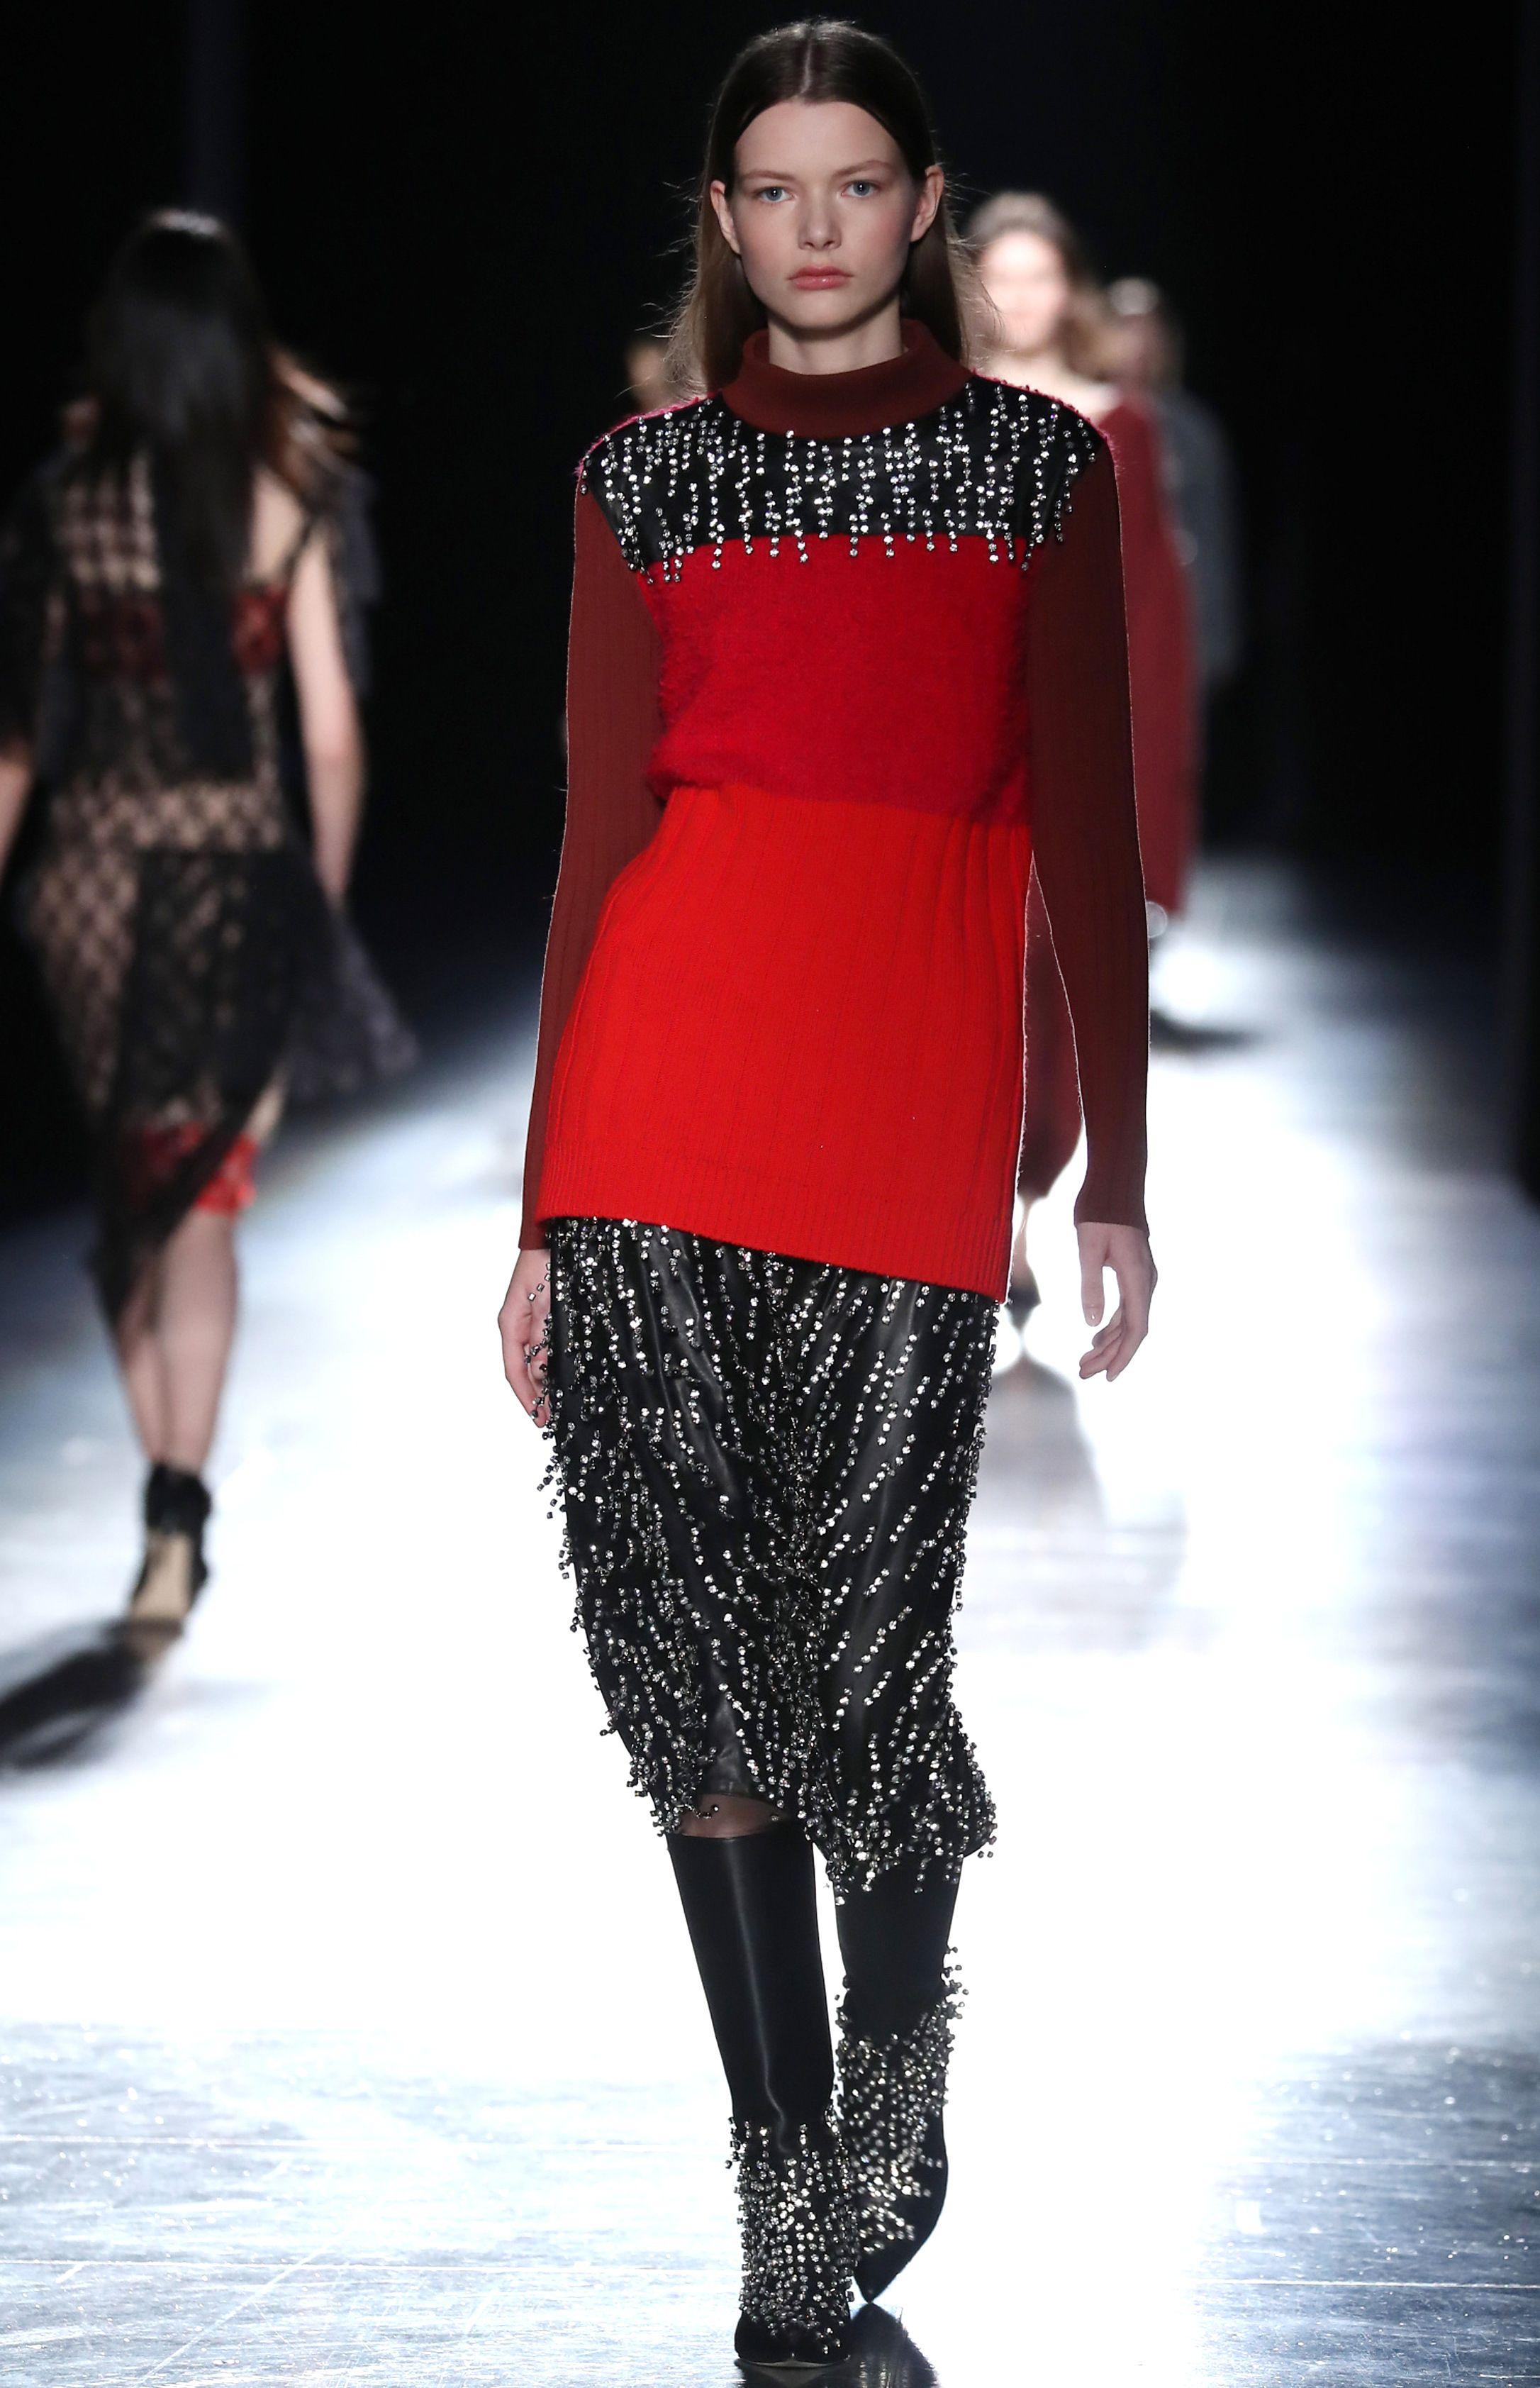 Christopher Kane FW 09 | Fashion, Skirt fashion, Fashion